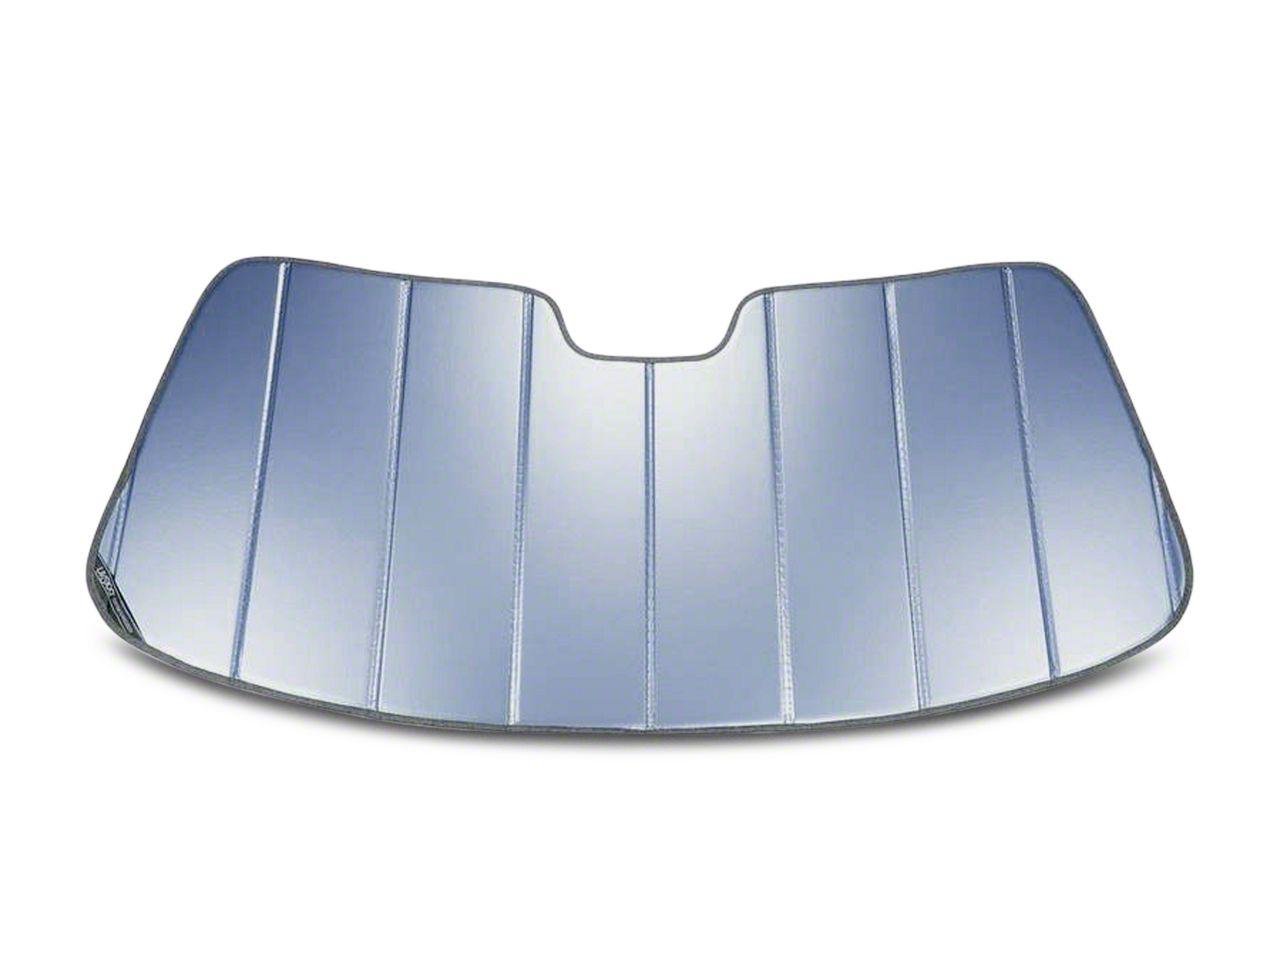 Covercraft UVS100 Custom Sunscreen - Blue (97-03 F-150)